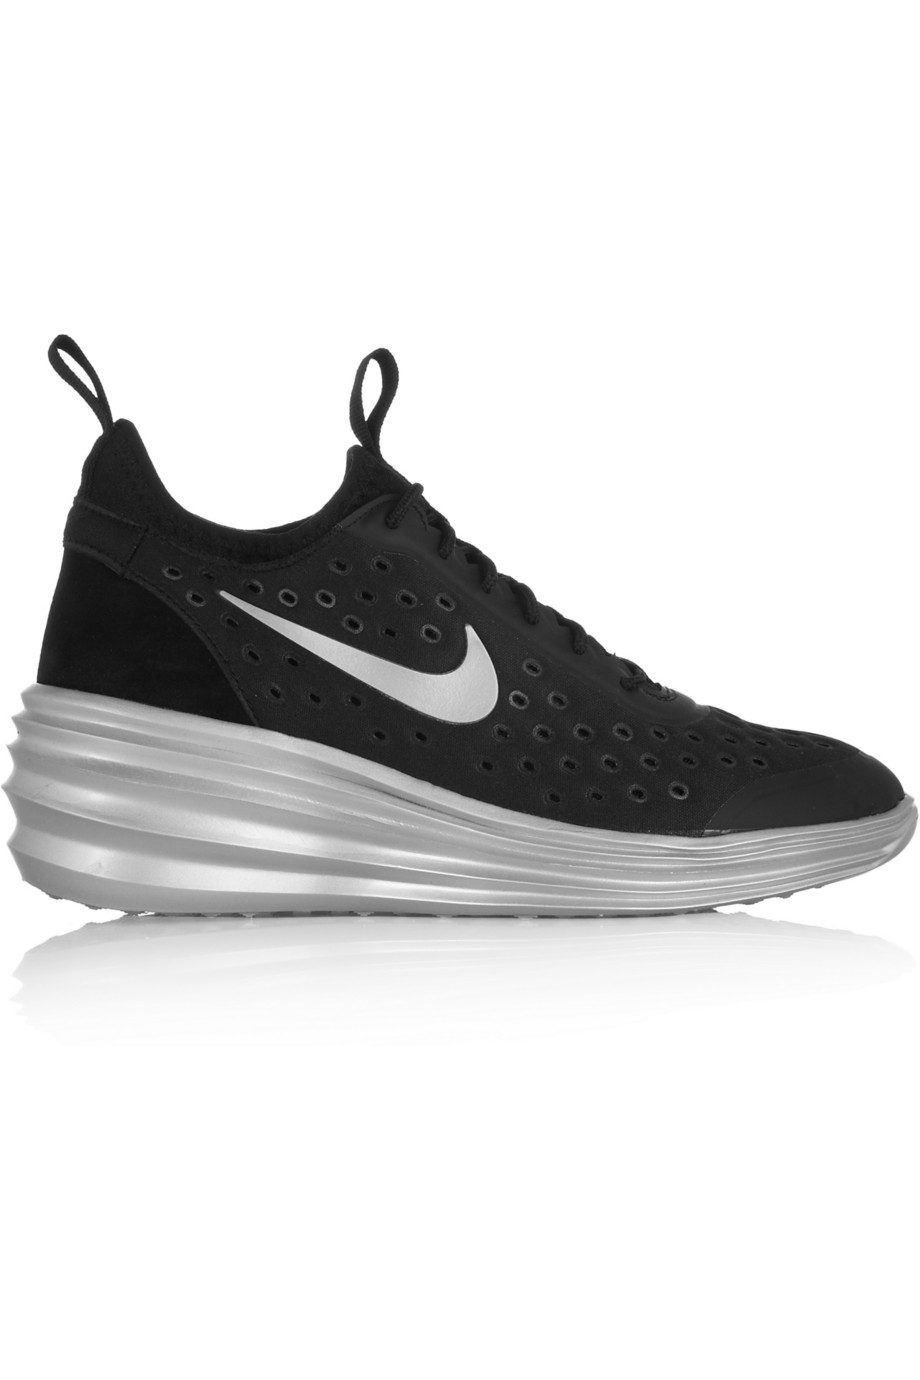 Nike LunarElite Sky Hi Canvas and Suede Wedge Sneakers